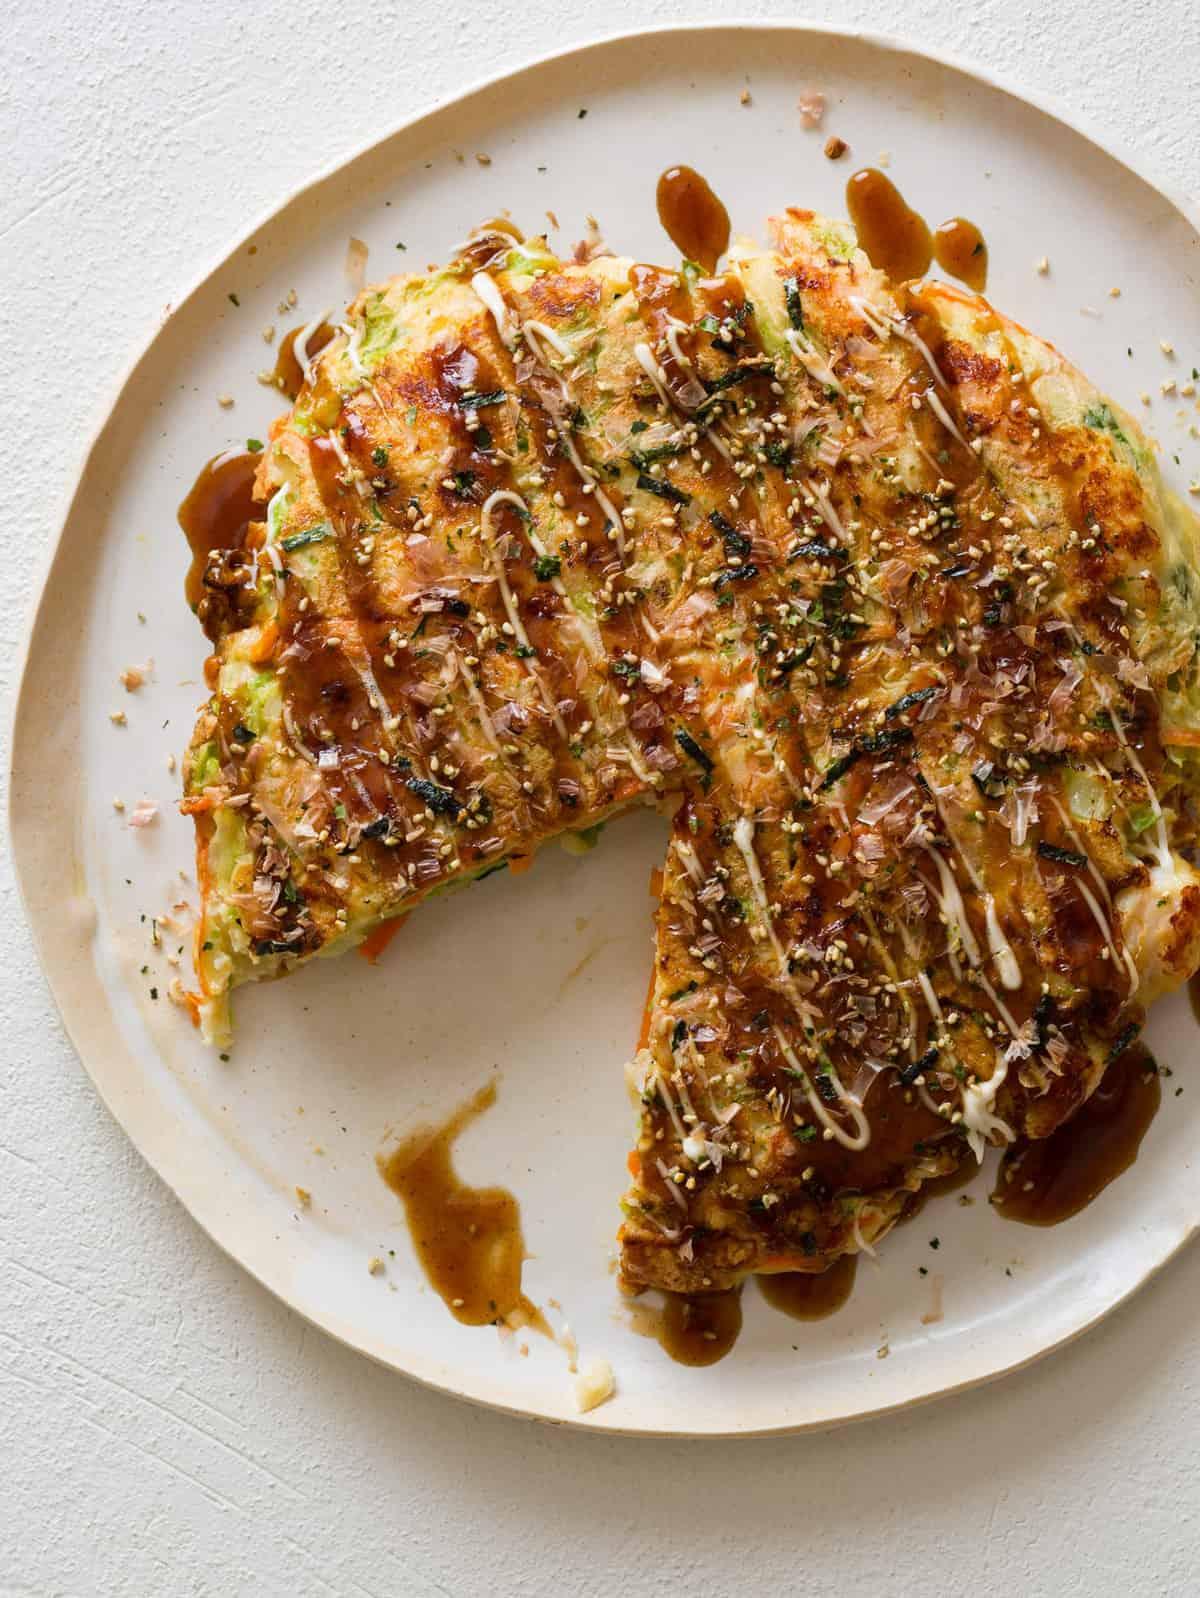 Shrimp okonomiyaki with a slice taken out on a white plate.